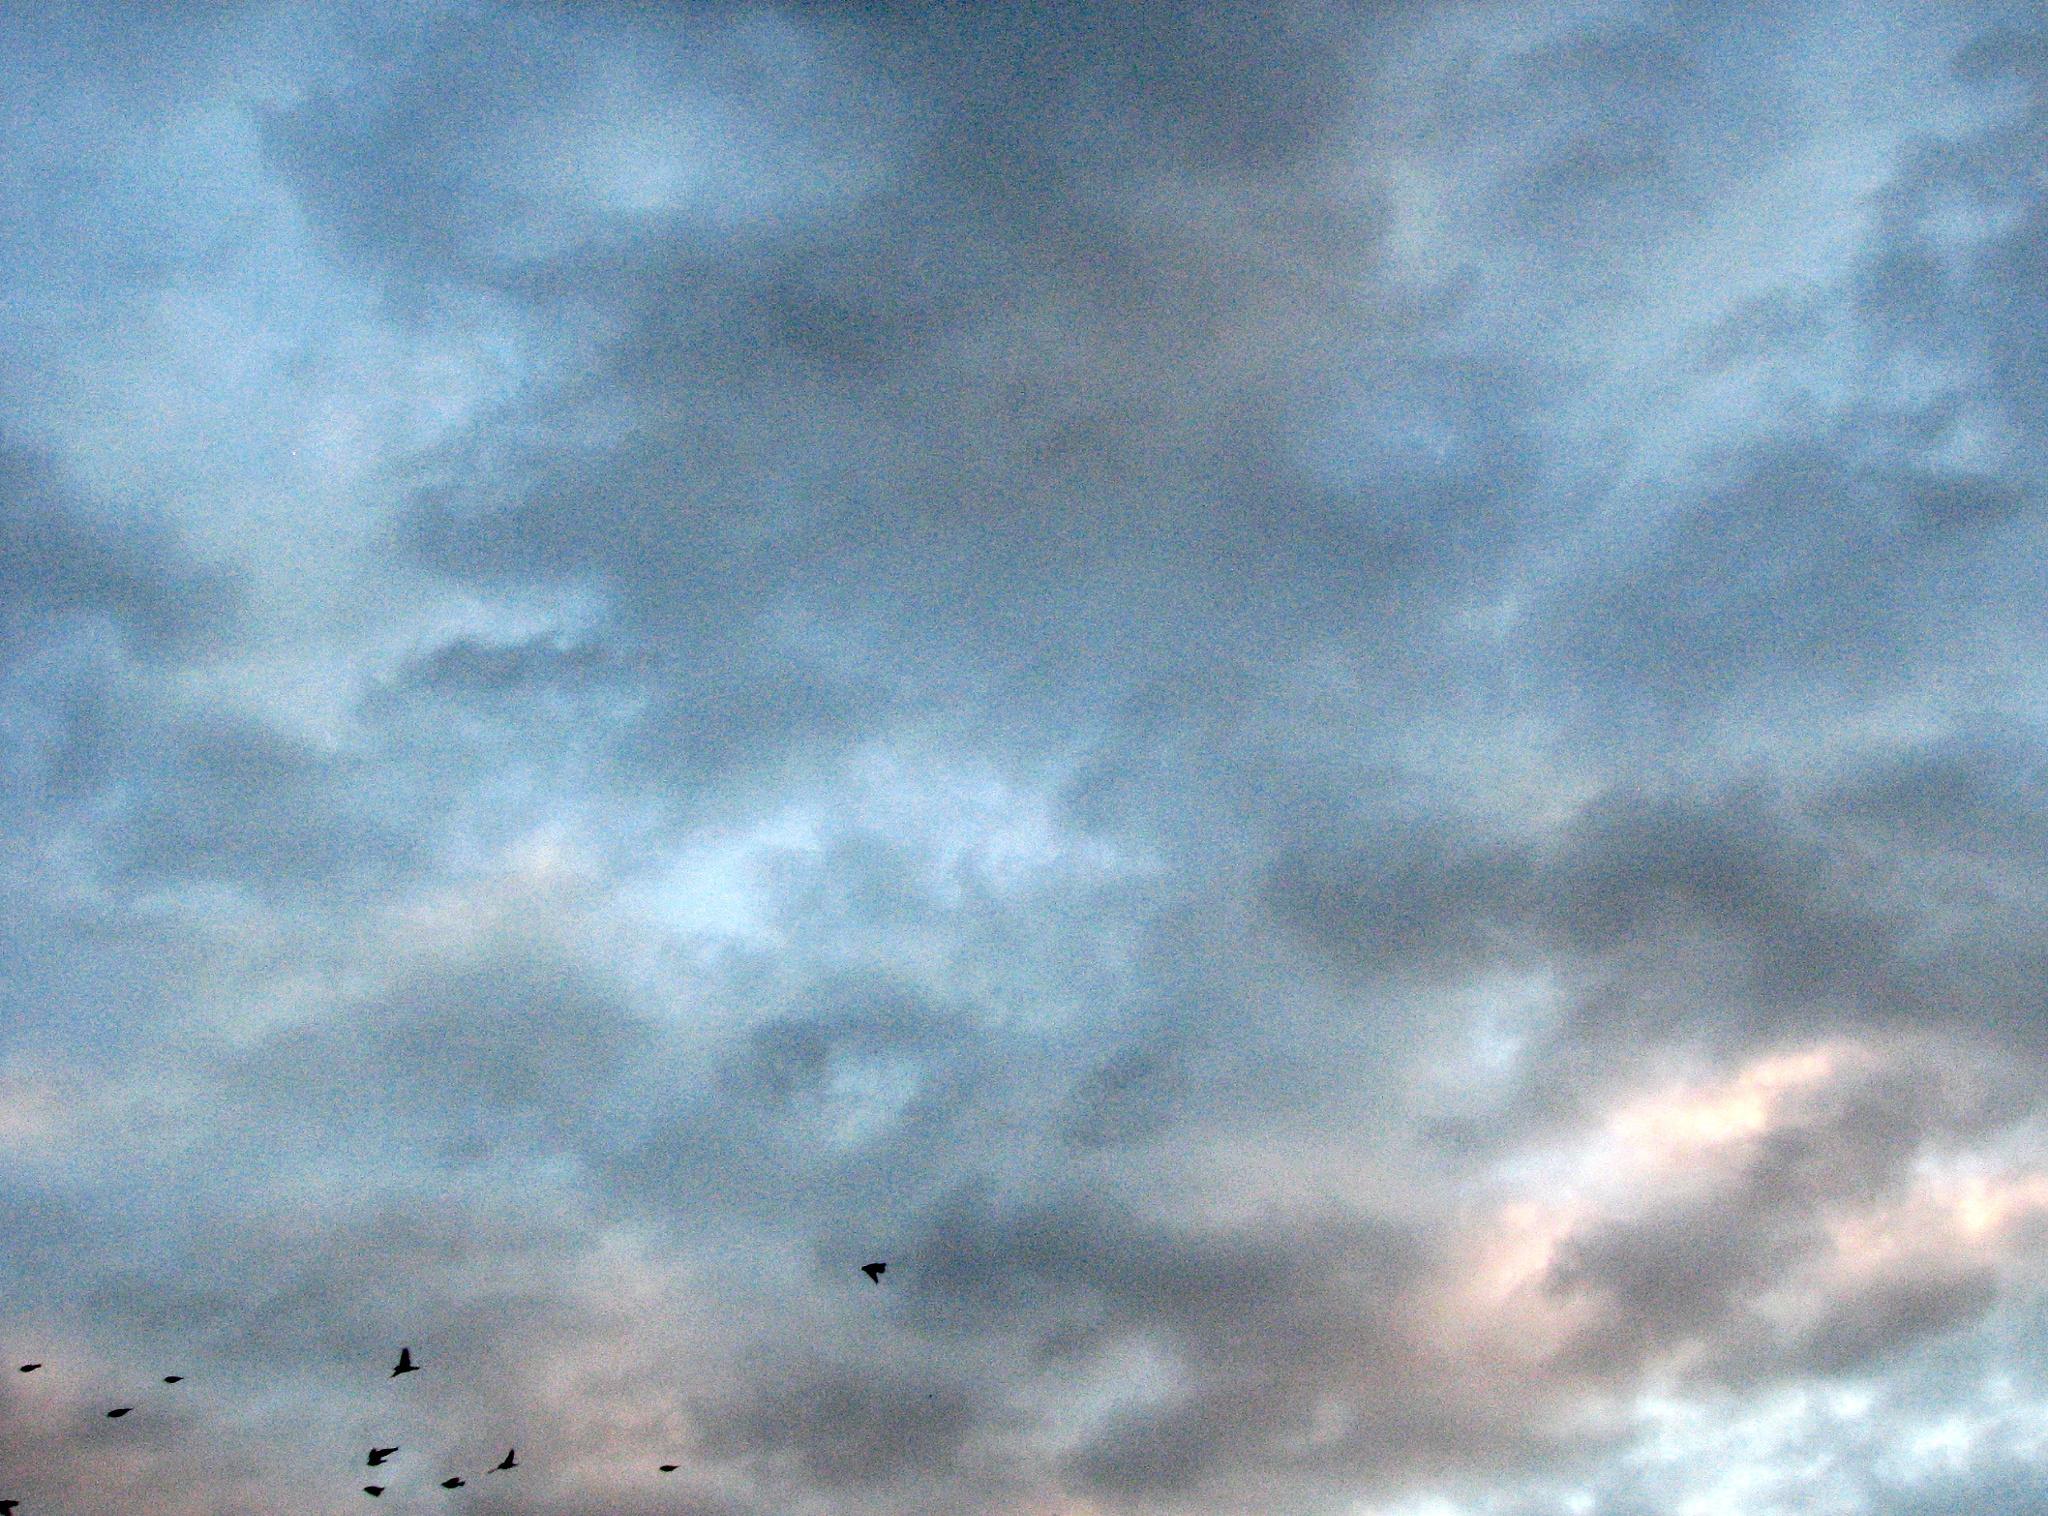 November sky 1 by natasakljukevic